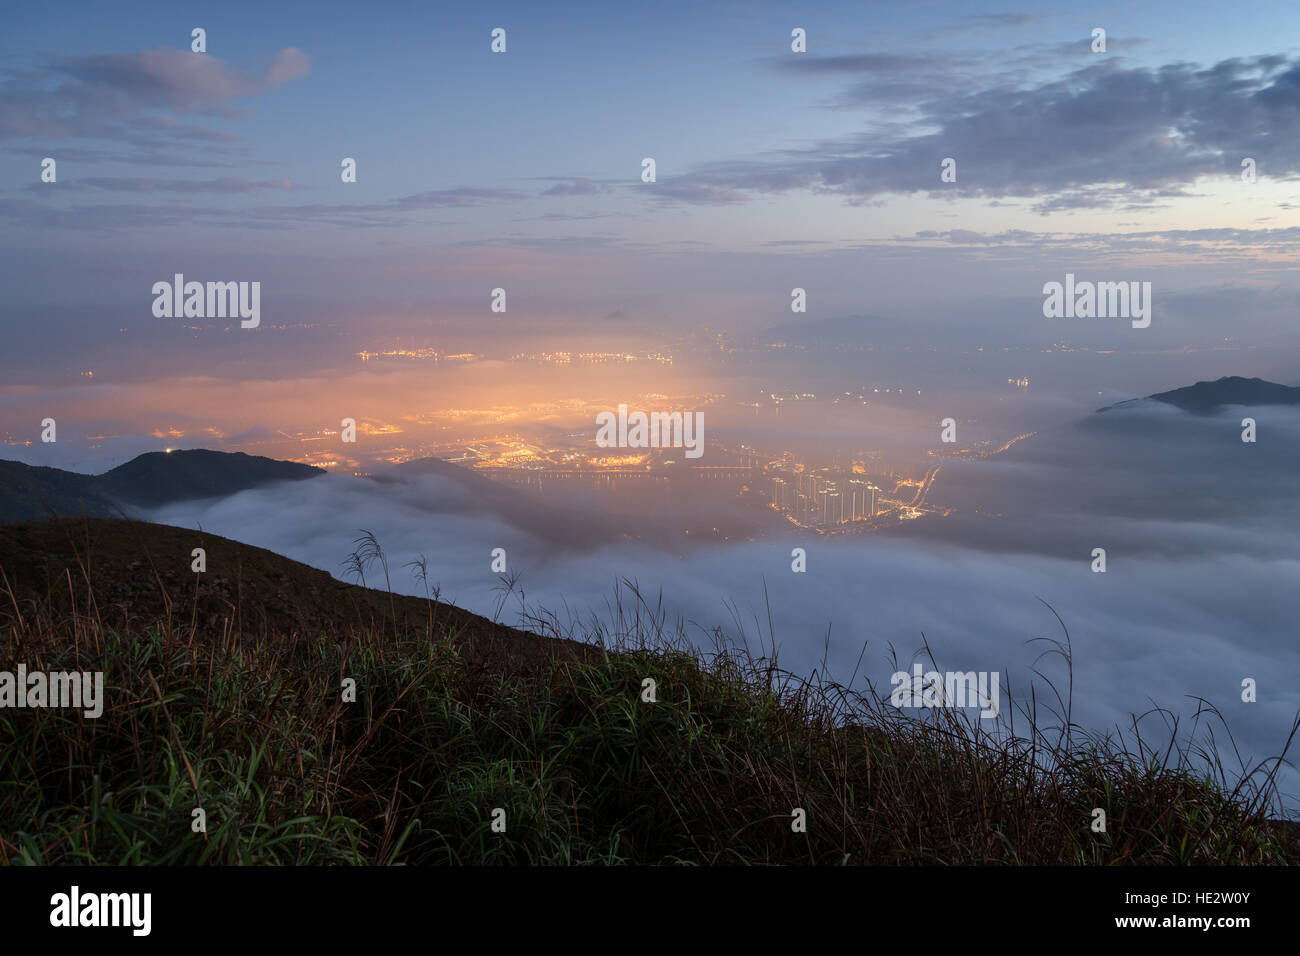 Lights of Tung Chung New Town below clouds on Lantau Island, viewed from the Lantau Peak on Lantau Island in Hong - Stock Image